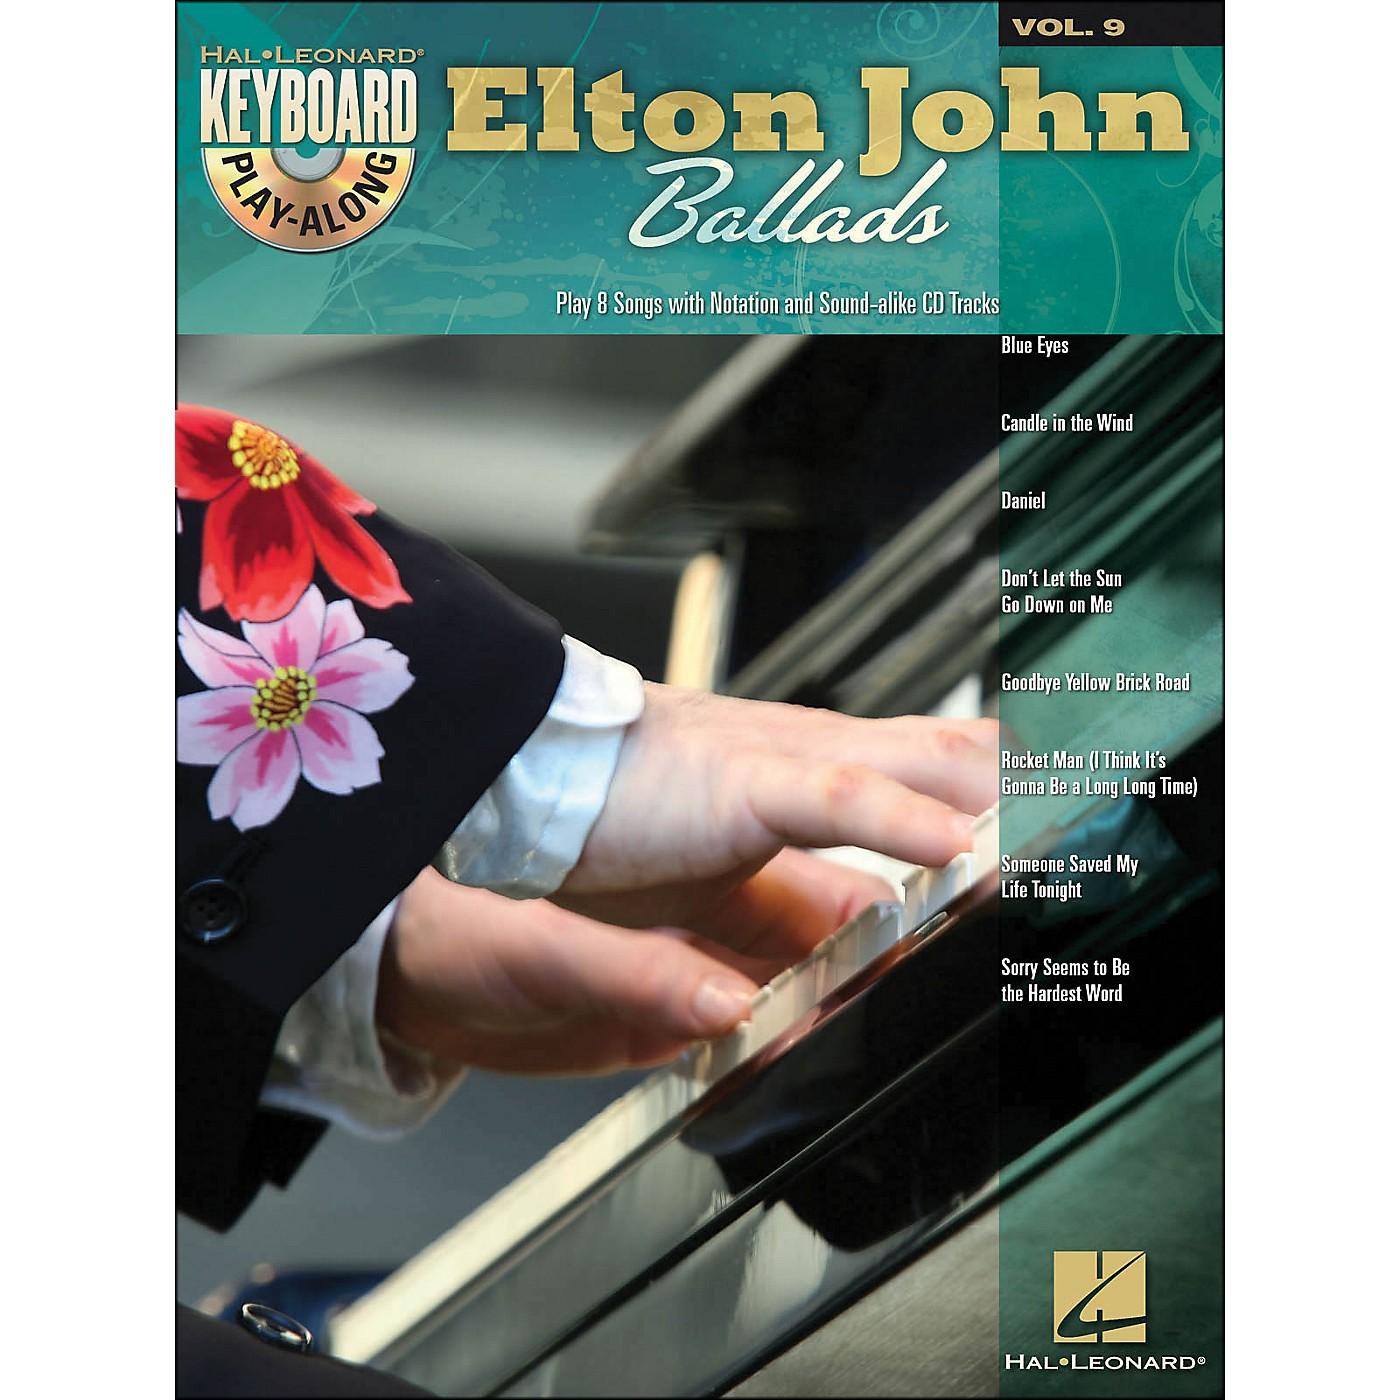 Hal Leonard Elton John Ballads - Keyboard Play-Along Volume 9 (Book/CD) thumbnail